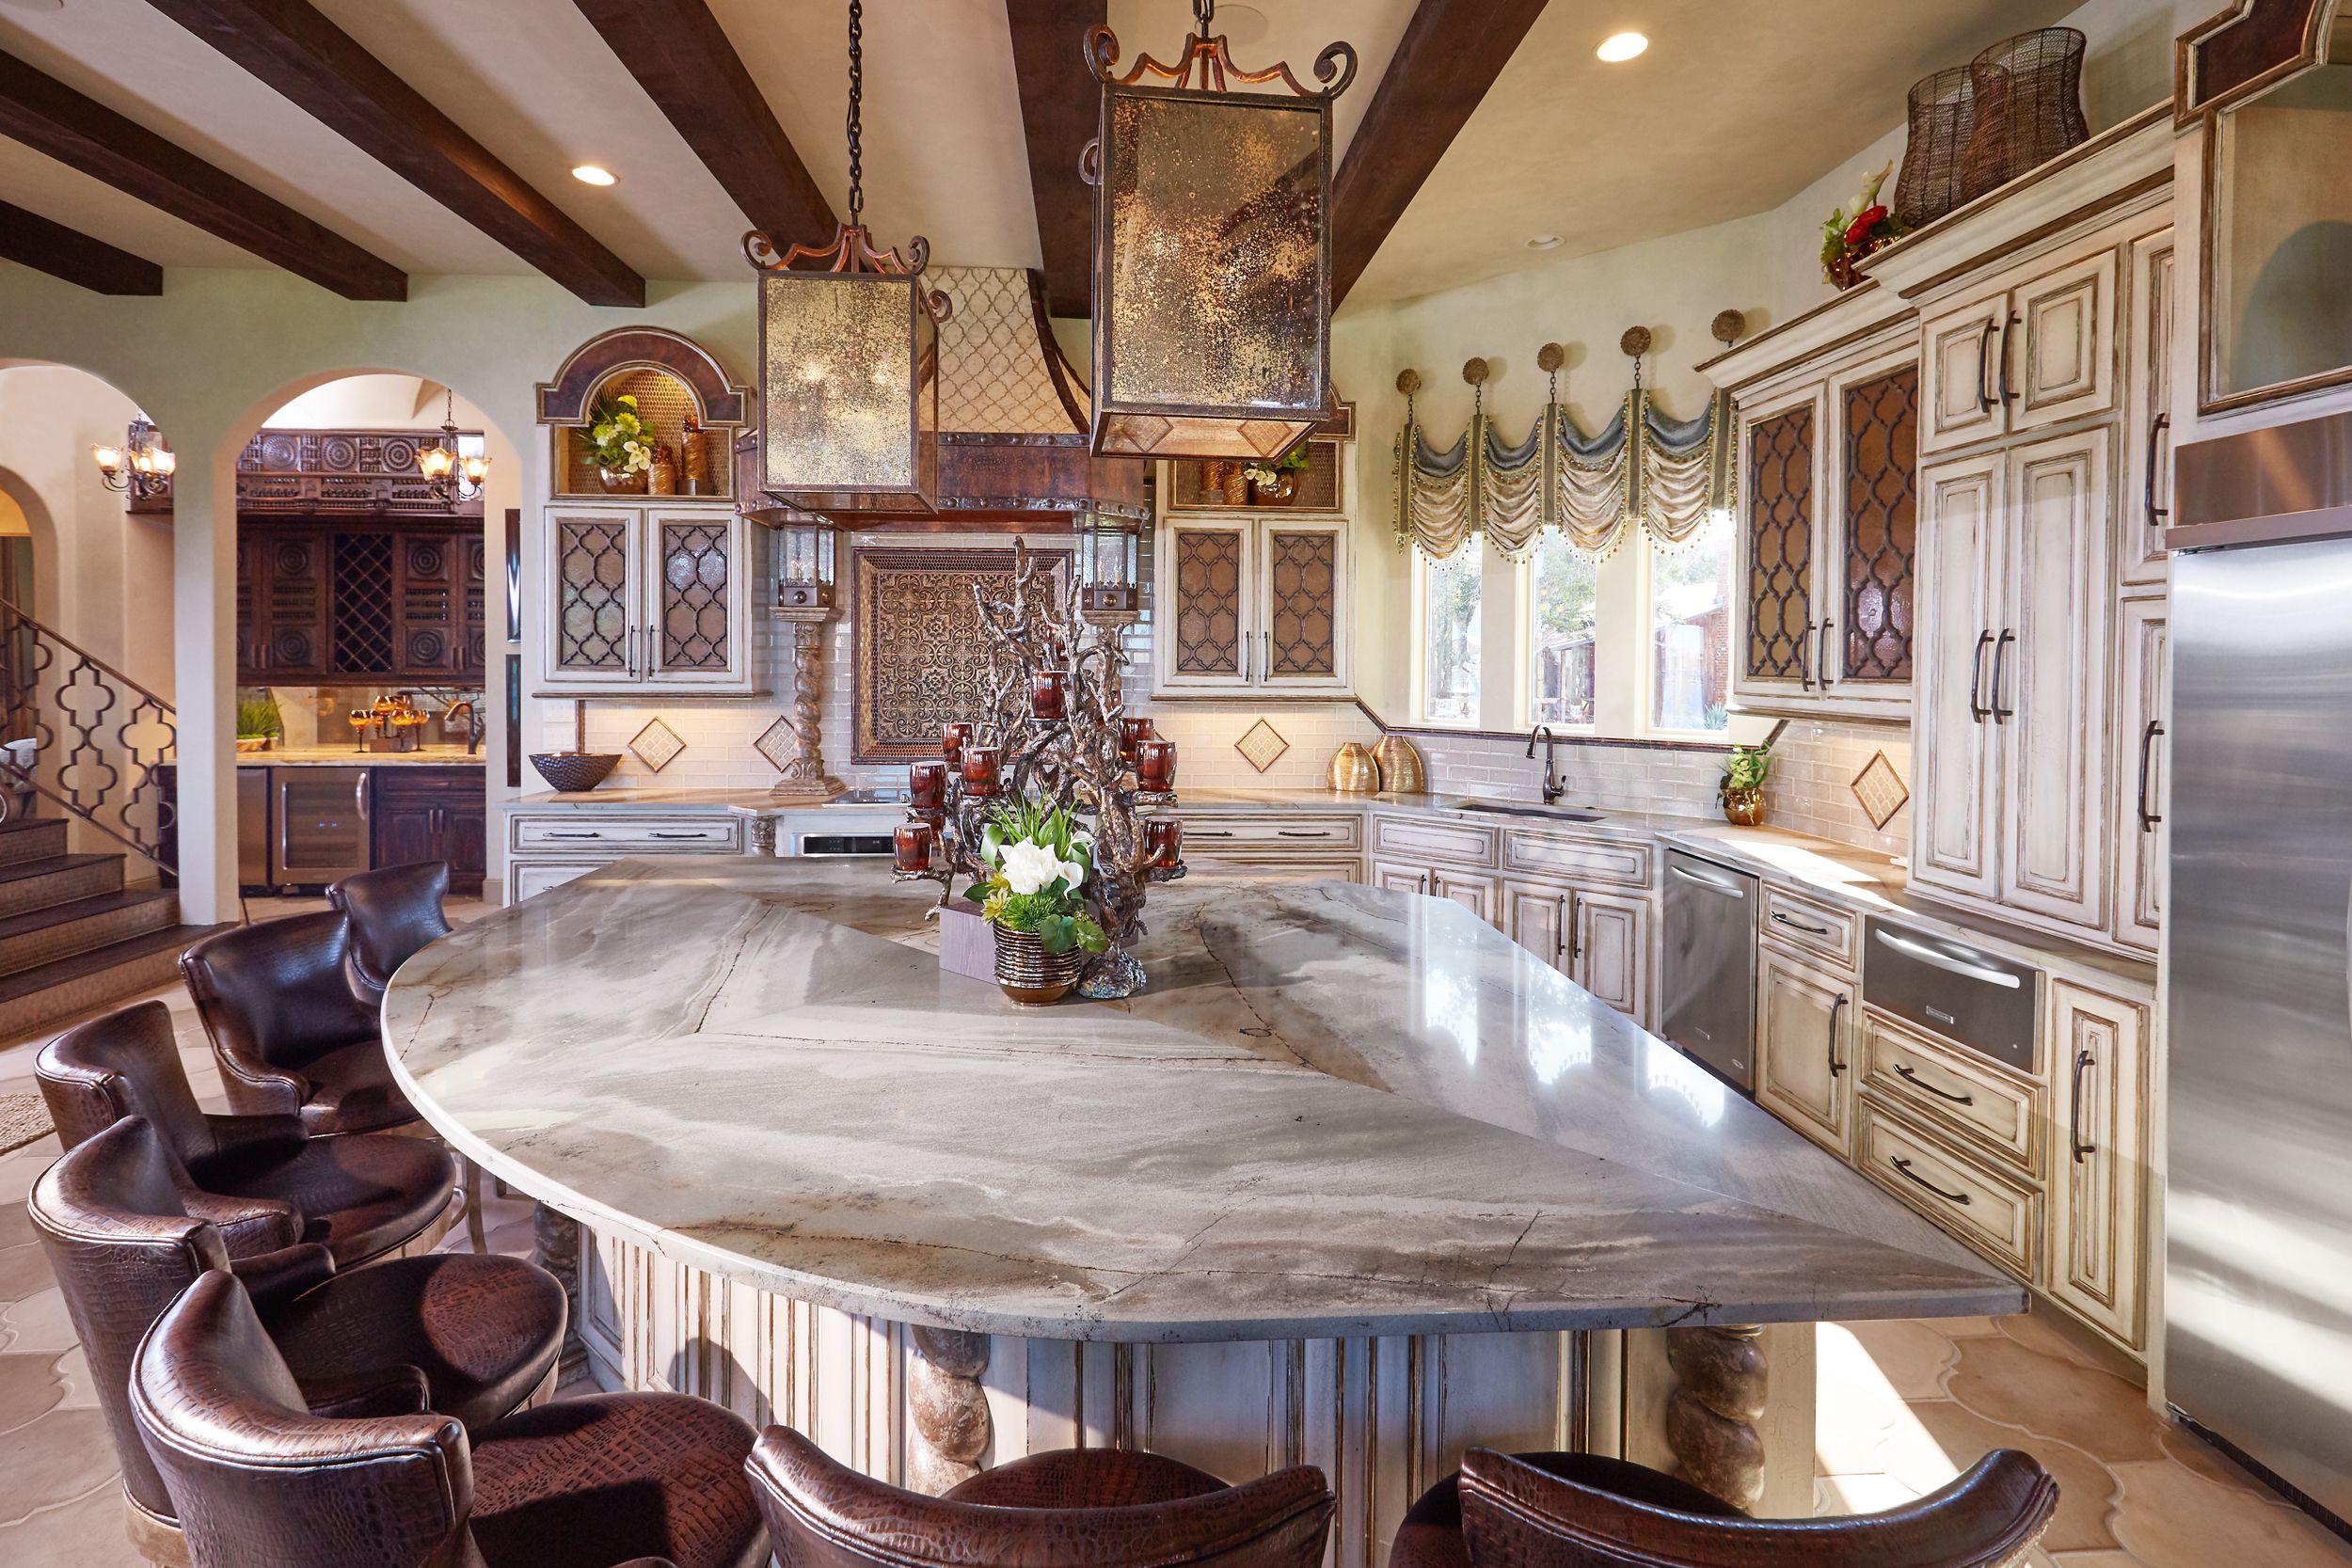 Custom Cabinetry Italian Villa Interior Design Grandeur